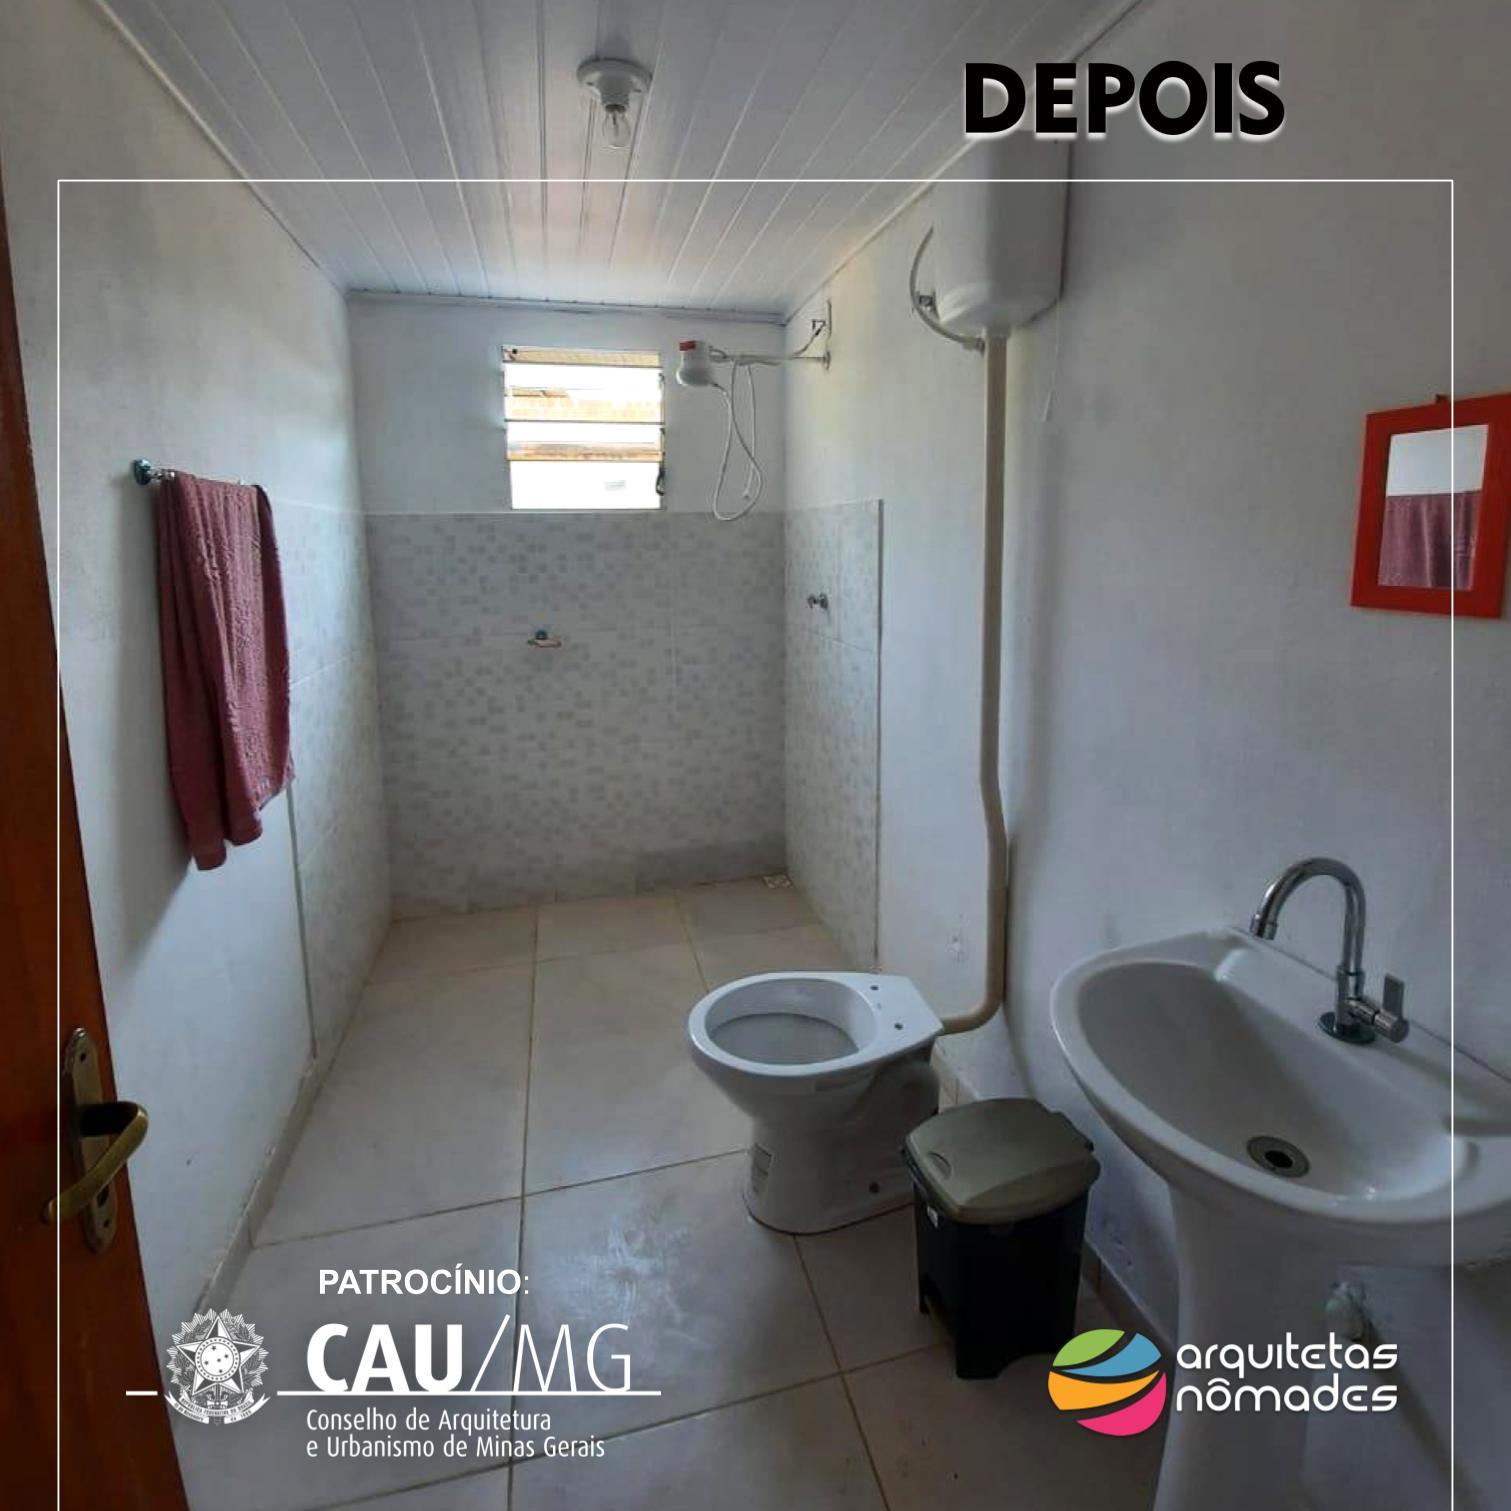 DEPOIS1